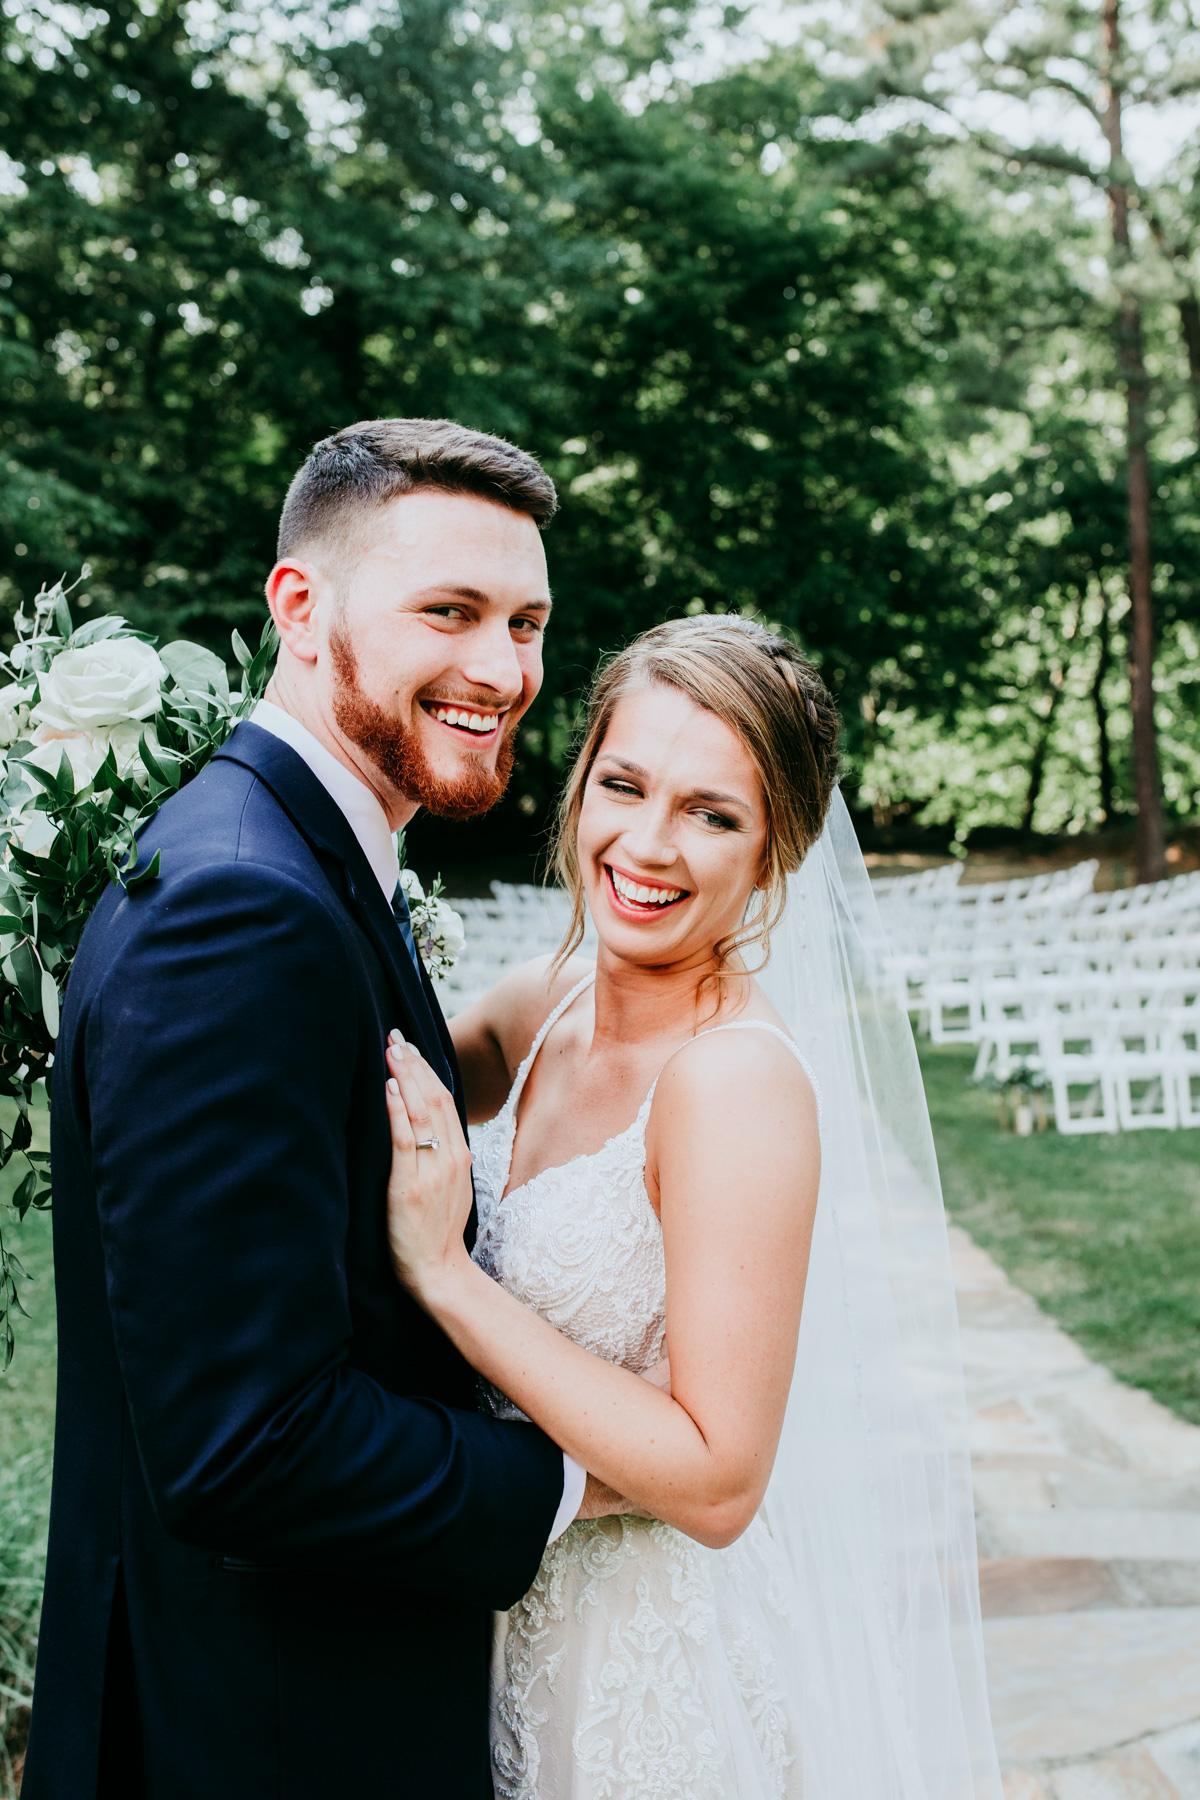 wedding-photo-ideas-bride-and-groom.jpg